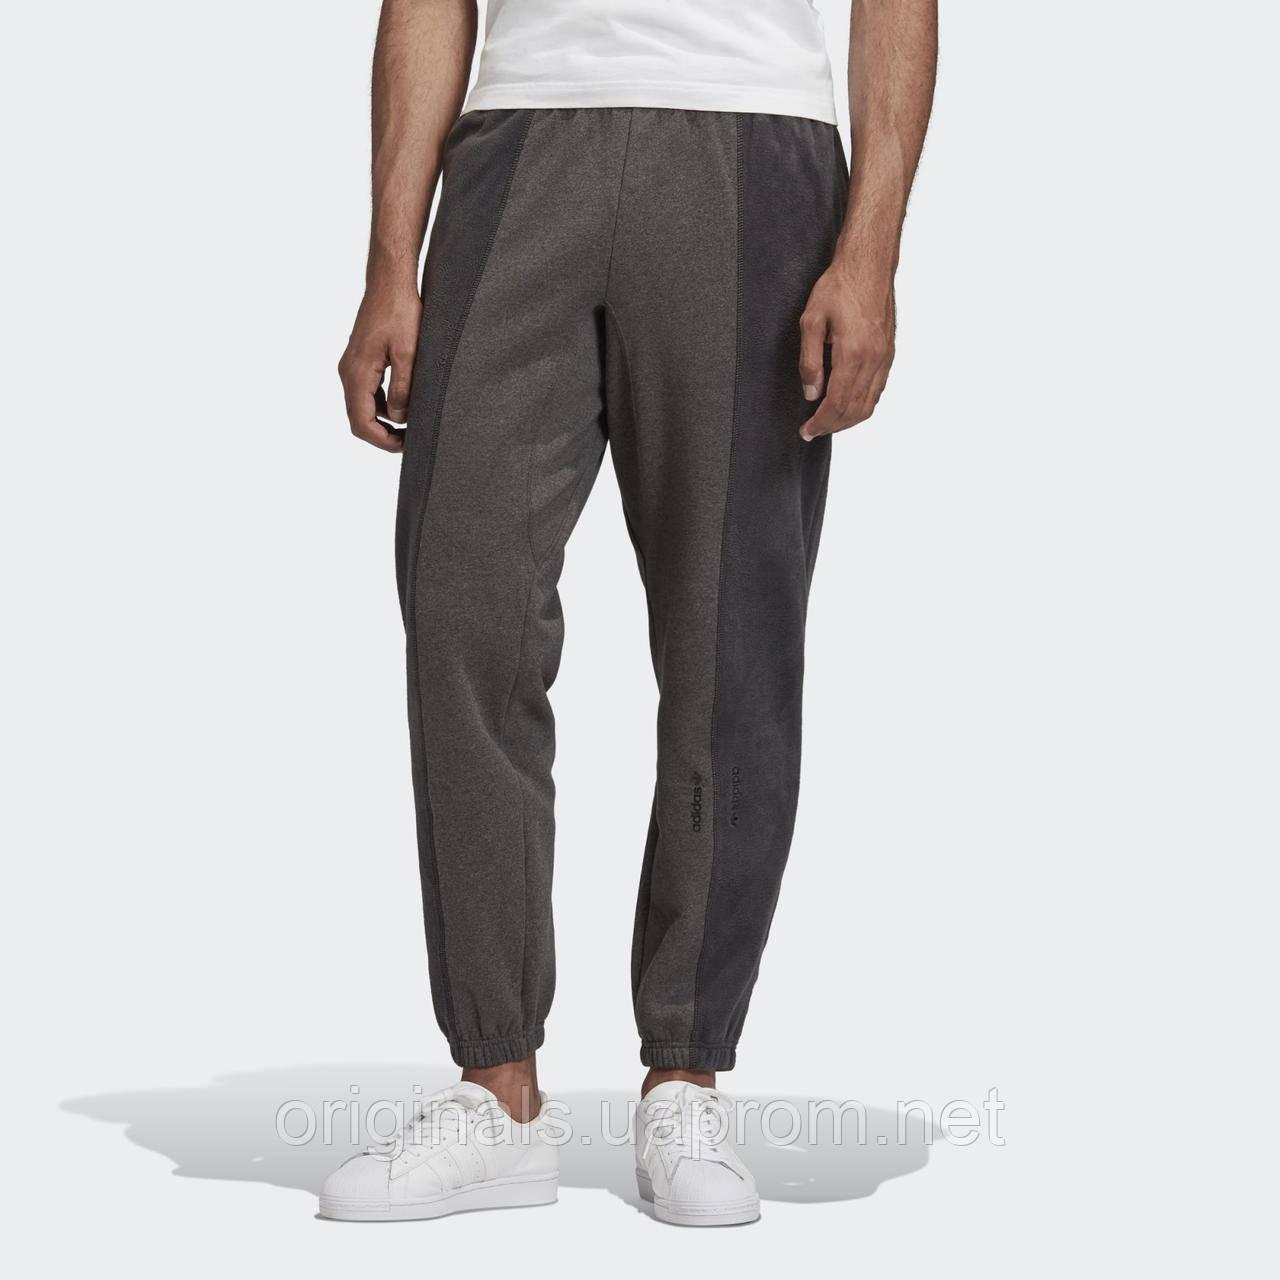 Джоггеры чоловічі Adidas R. Y. V. GD9342 2020/2